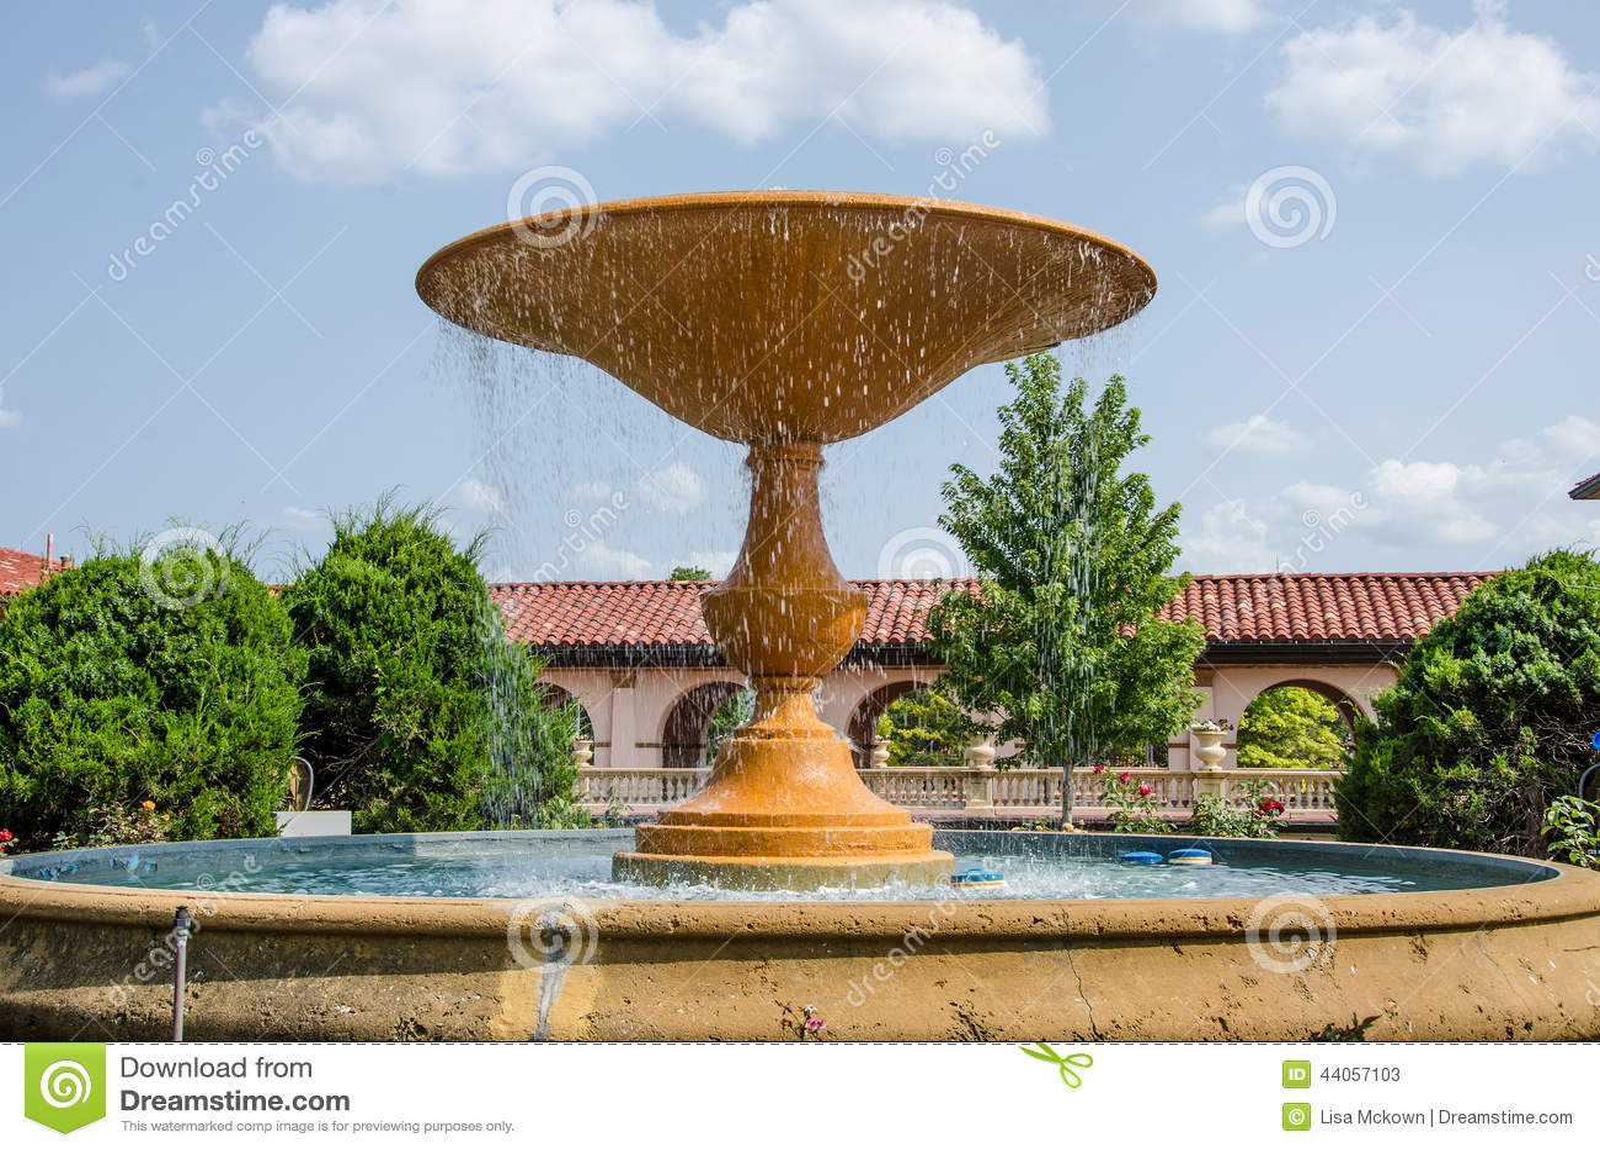 Beautiful Water Fountain In A Flower Garden Stock Photo